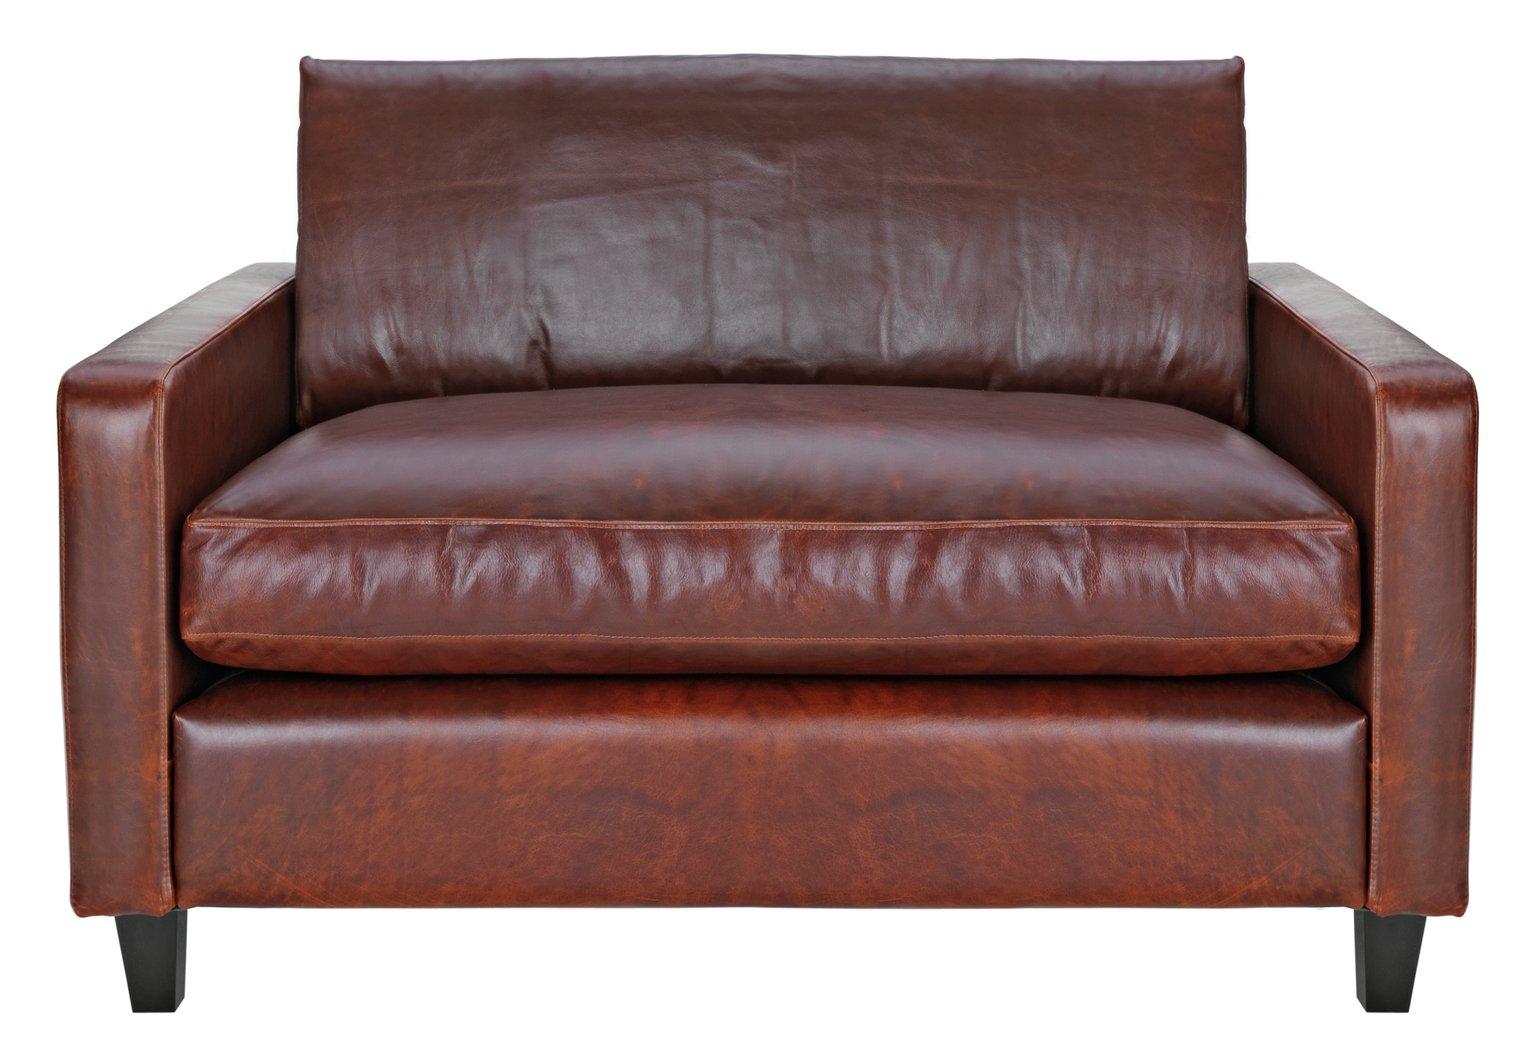 Habitat Chester Leather Compact Sofa - Tan